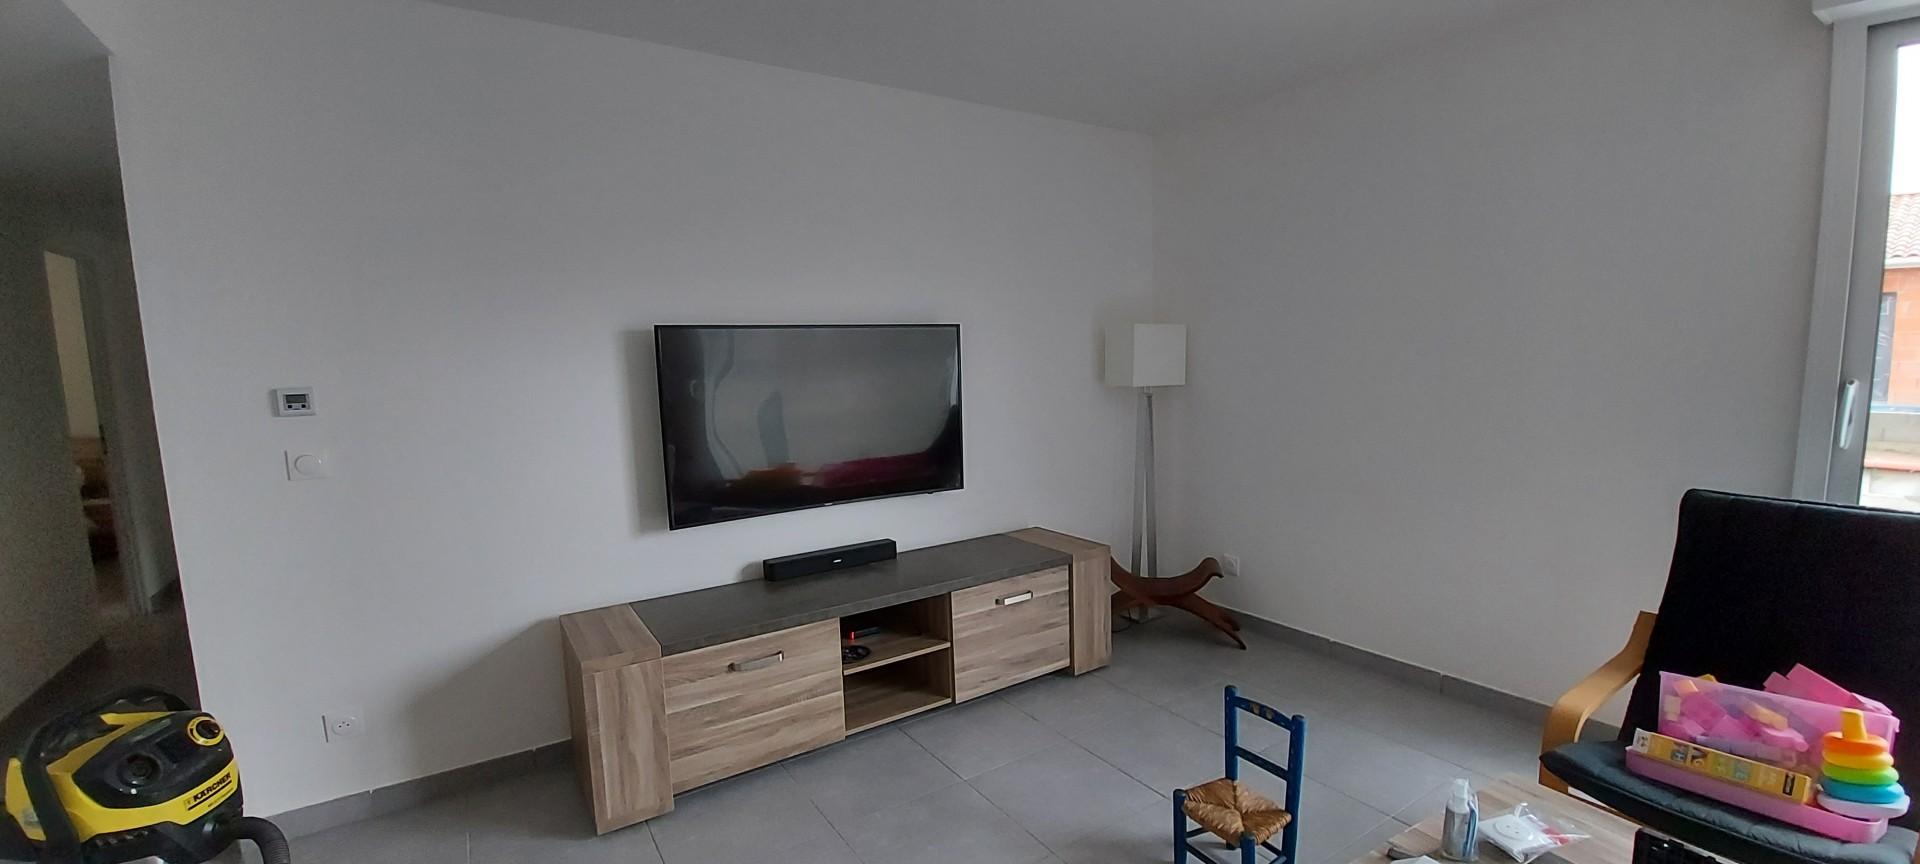 Photo de galerie - Bricolage - Petits travaux